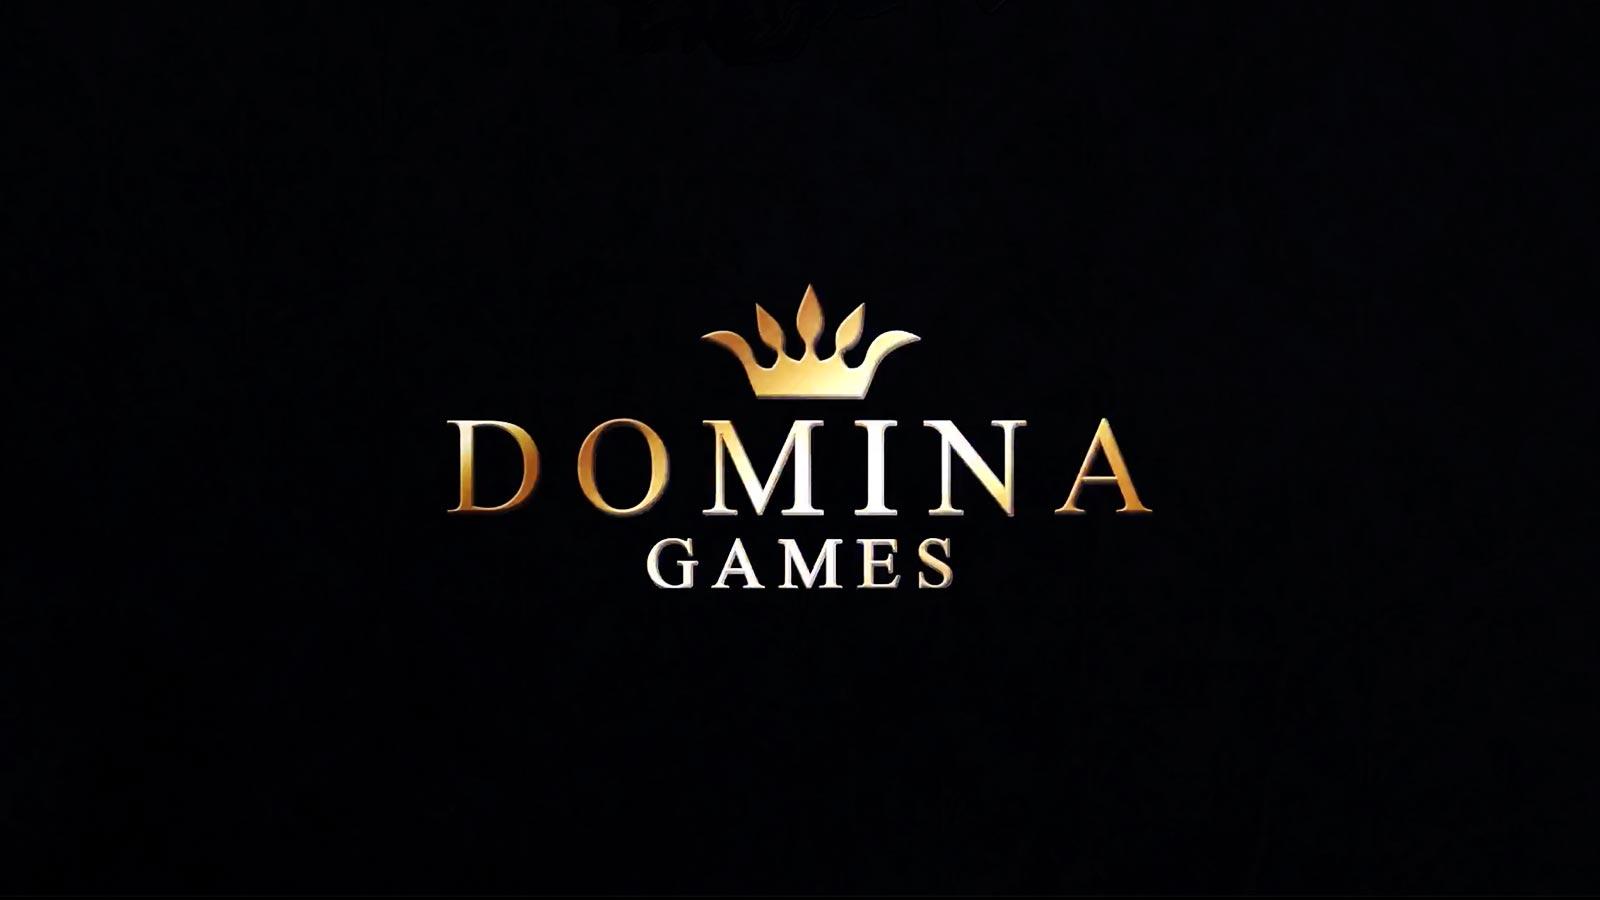 DOMINA GAMES